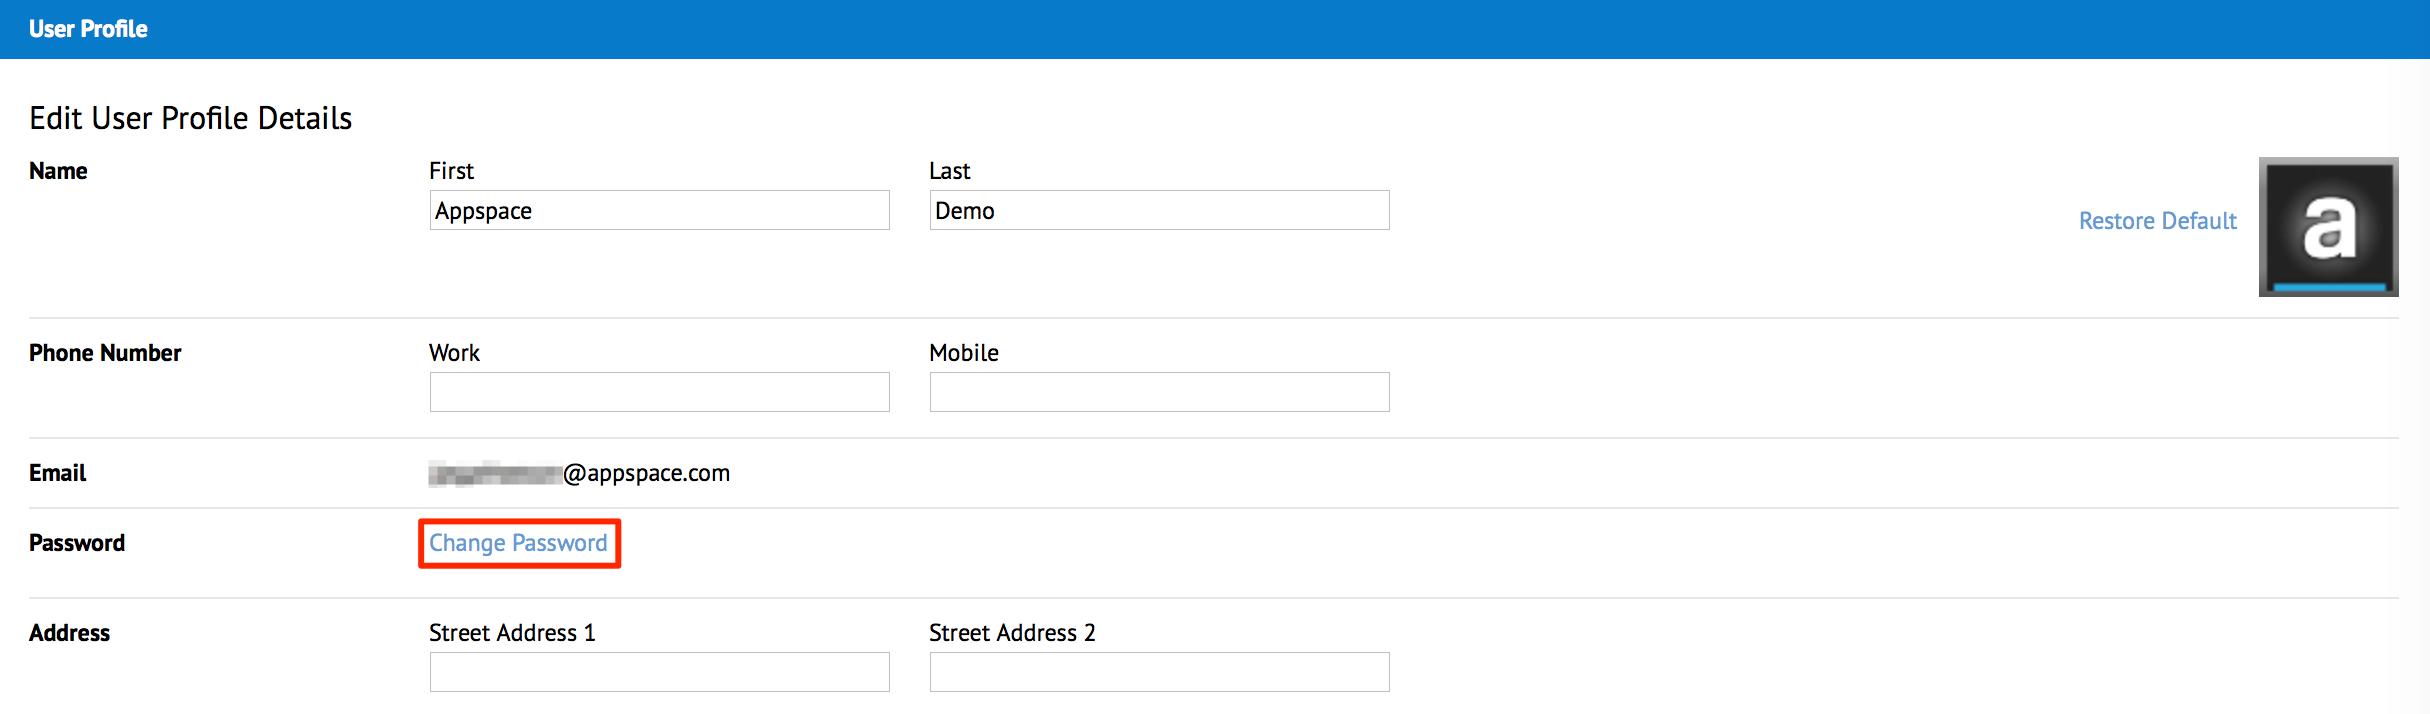 How do I change my password? — Appspace v7 0 Documentation